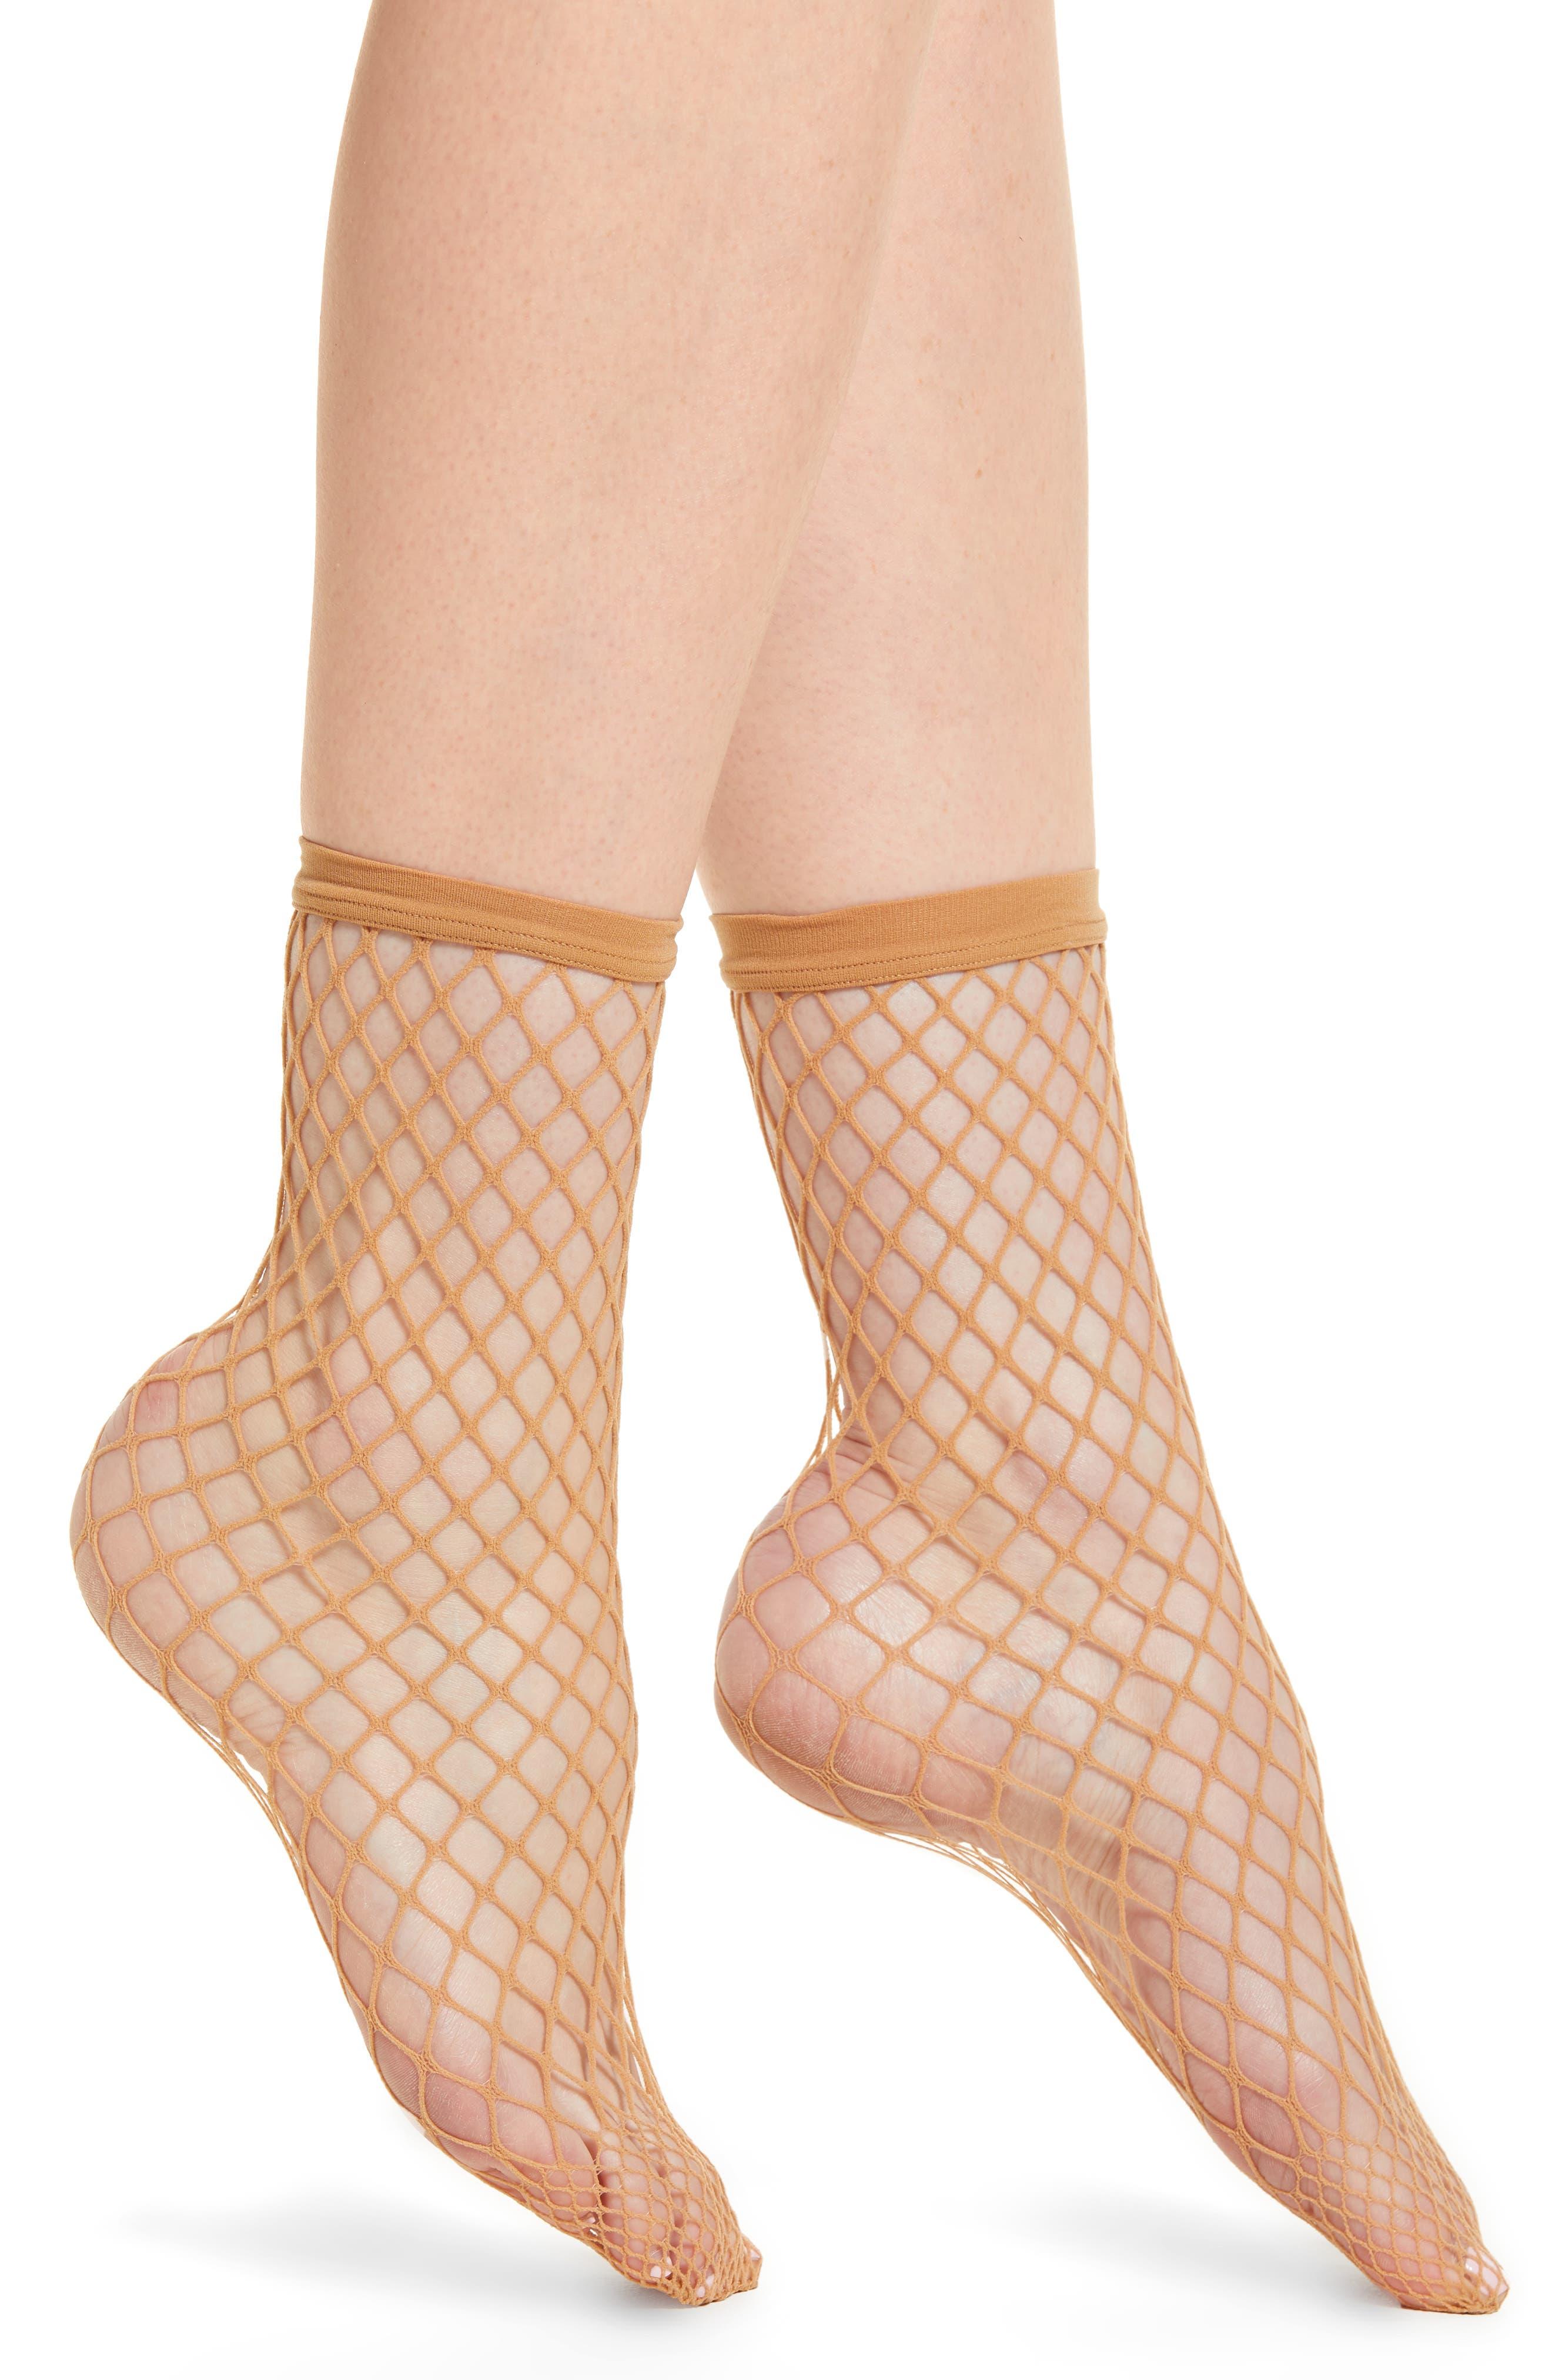 Tina Summer Net Ankle Socks,                         Main,                         color, Gobi